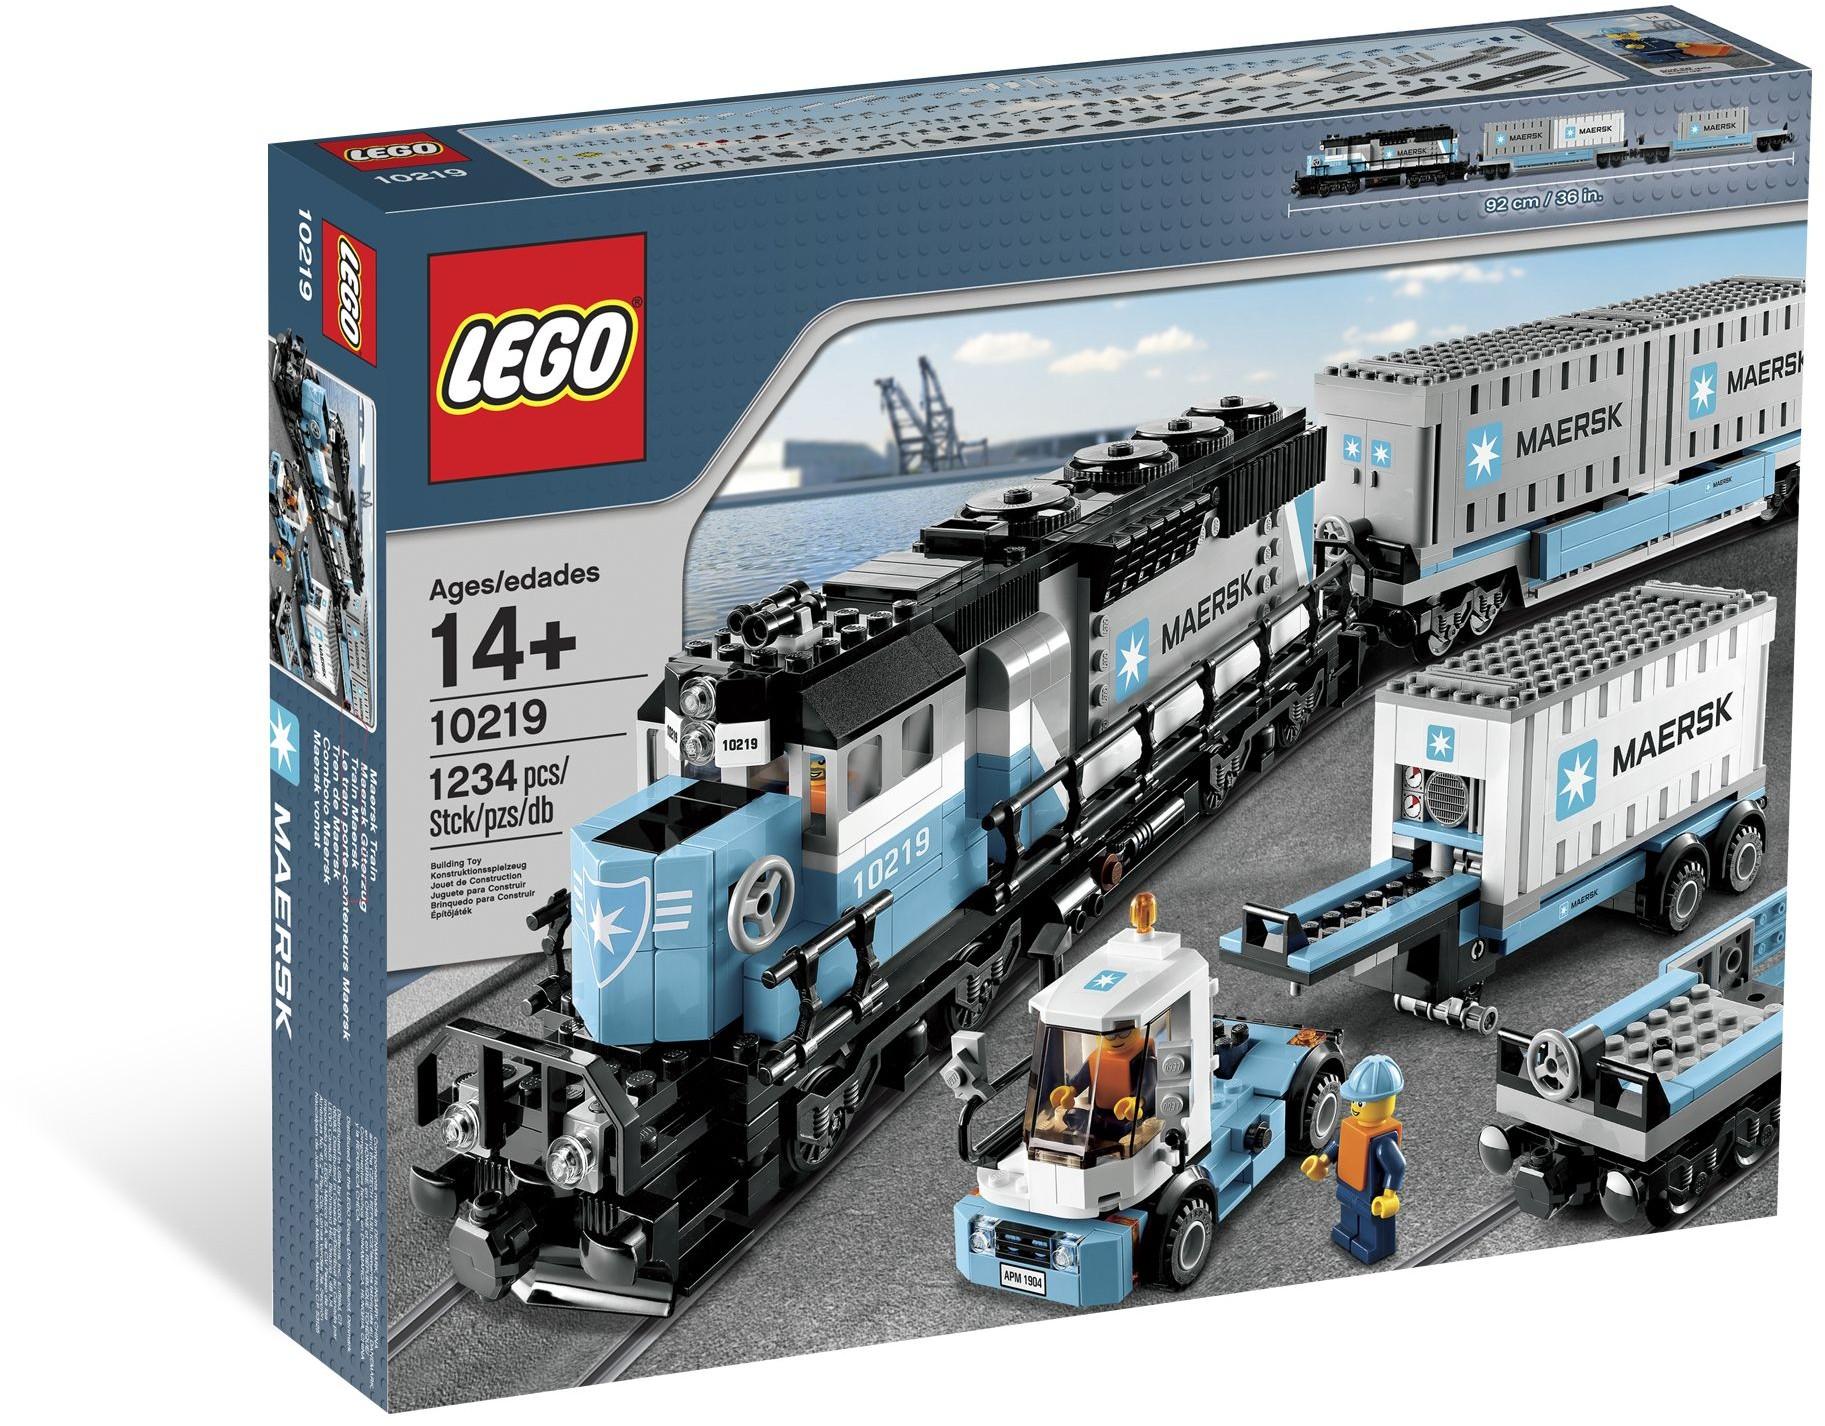 Set Nou: 10219 Maersk Train